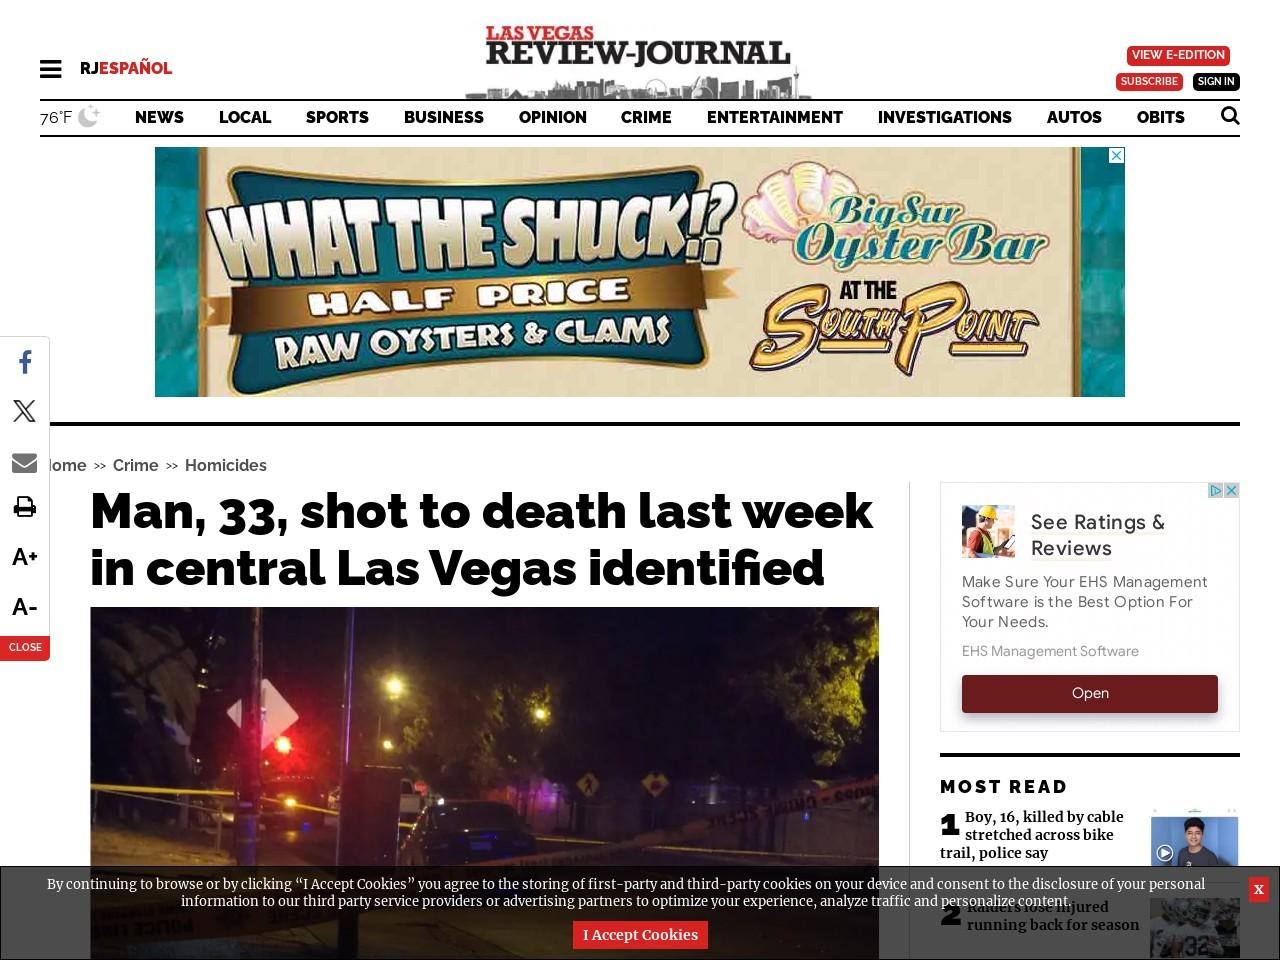 Man, 33, shot to death last week in central Las Vegas identified